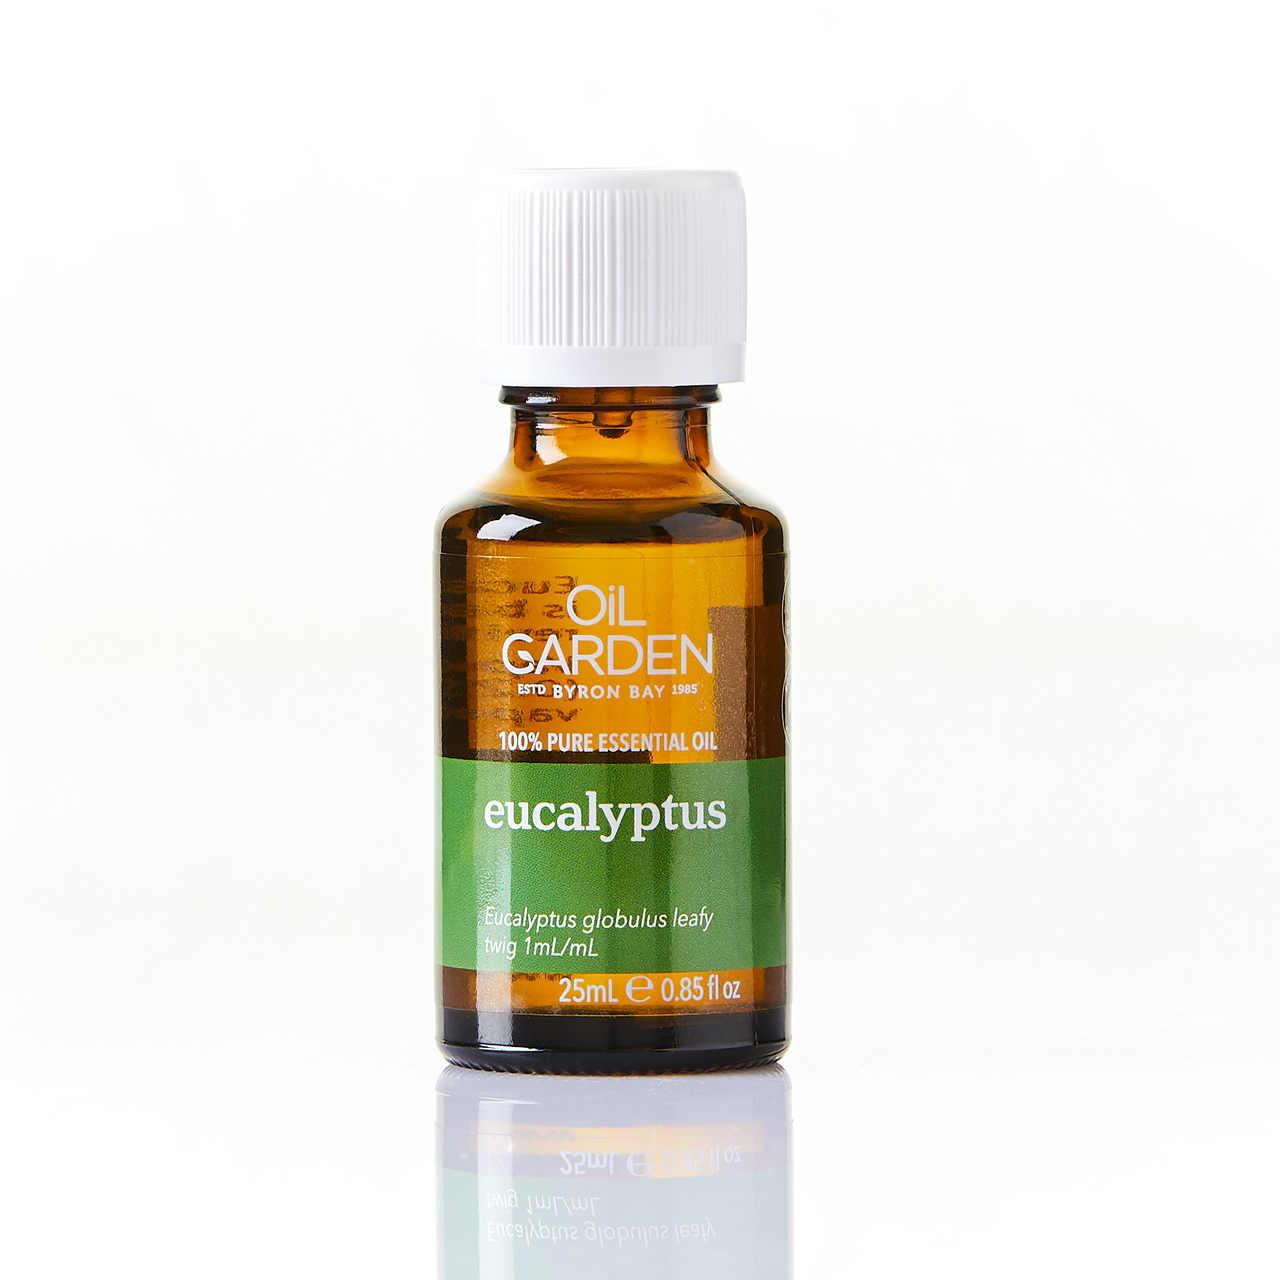 Oil Garden Eucalyptus Pure Essential Oil 25mL 6620072